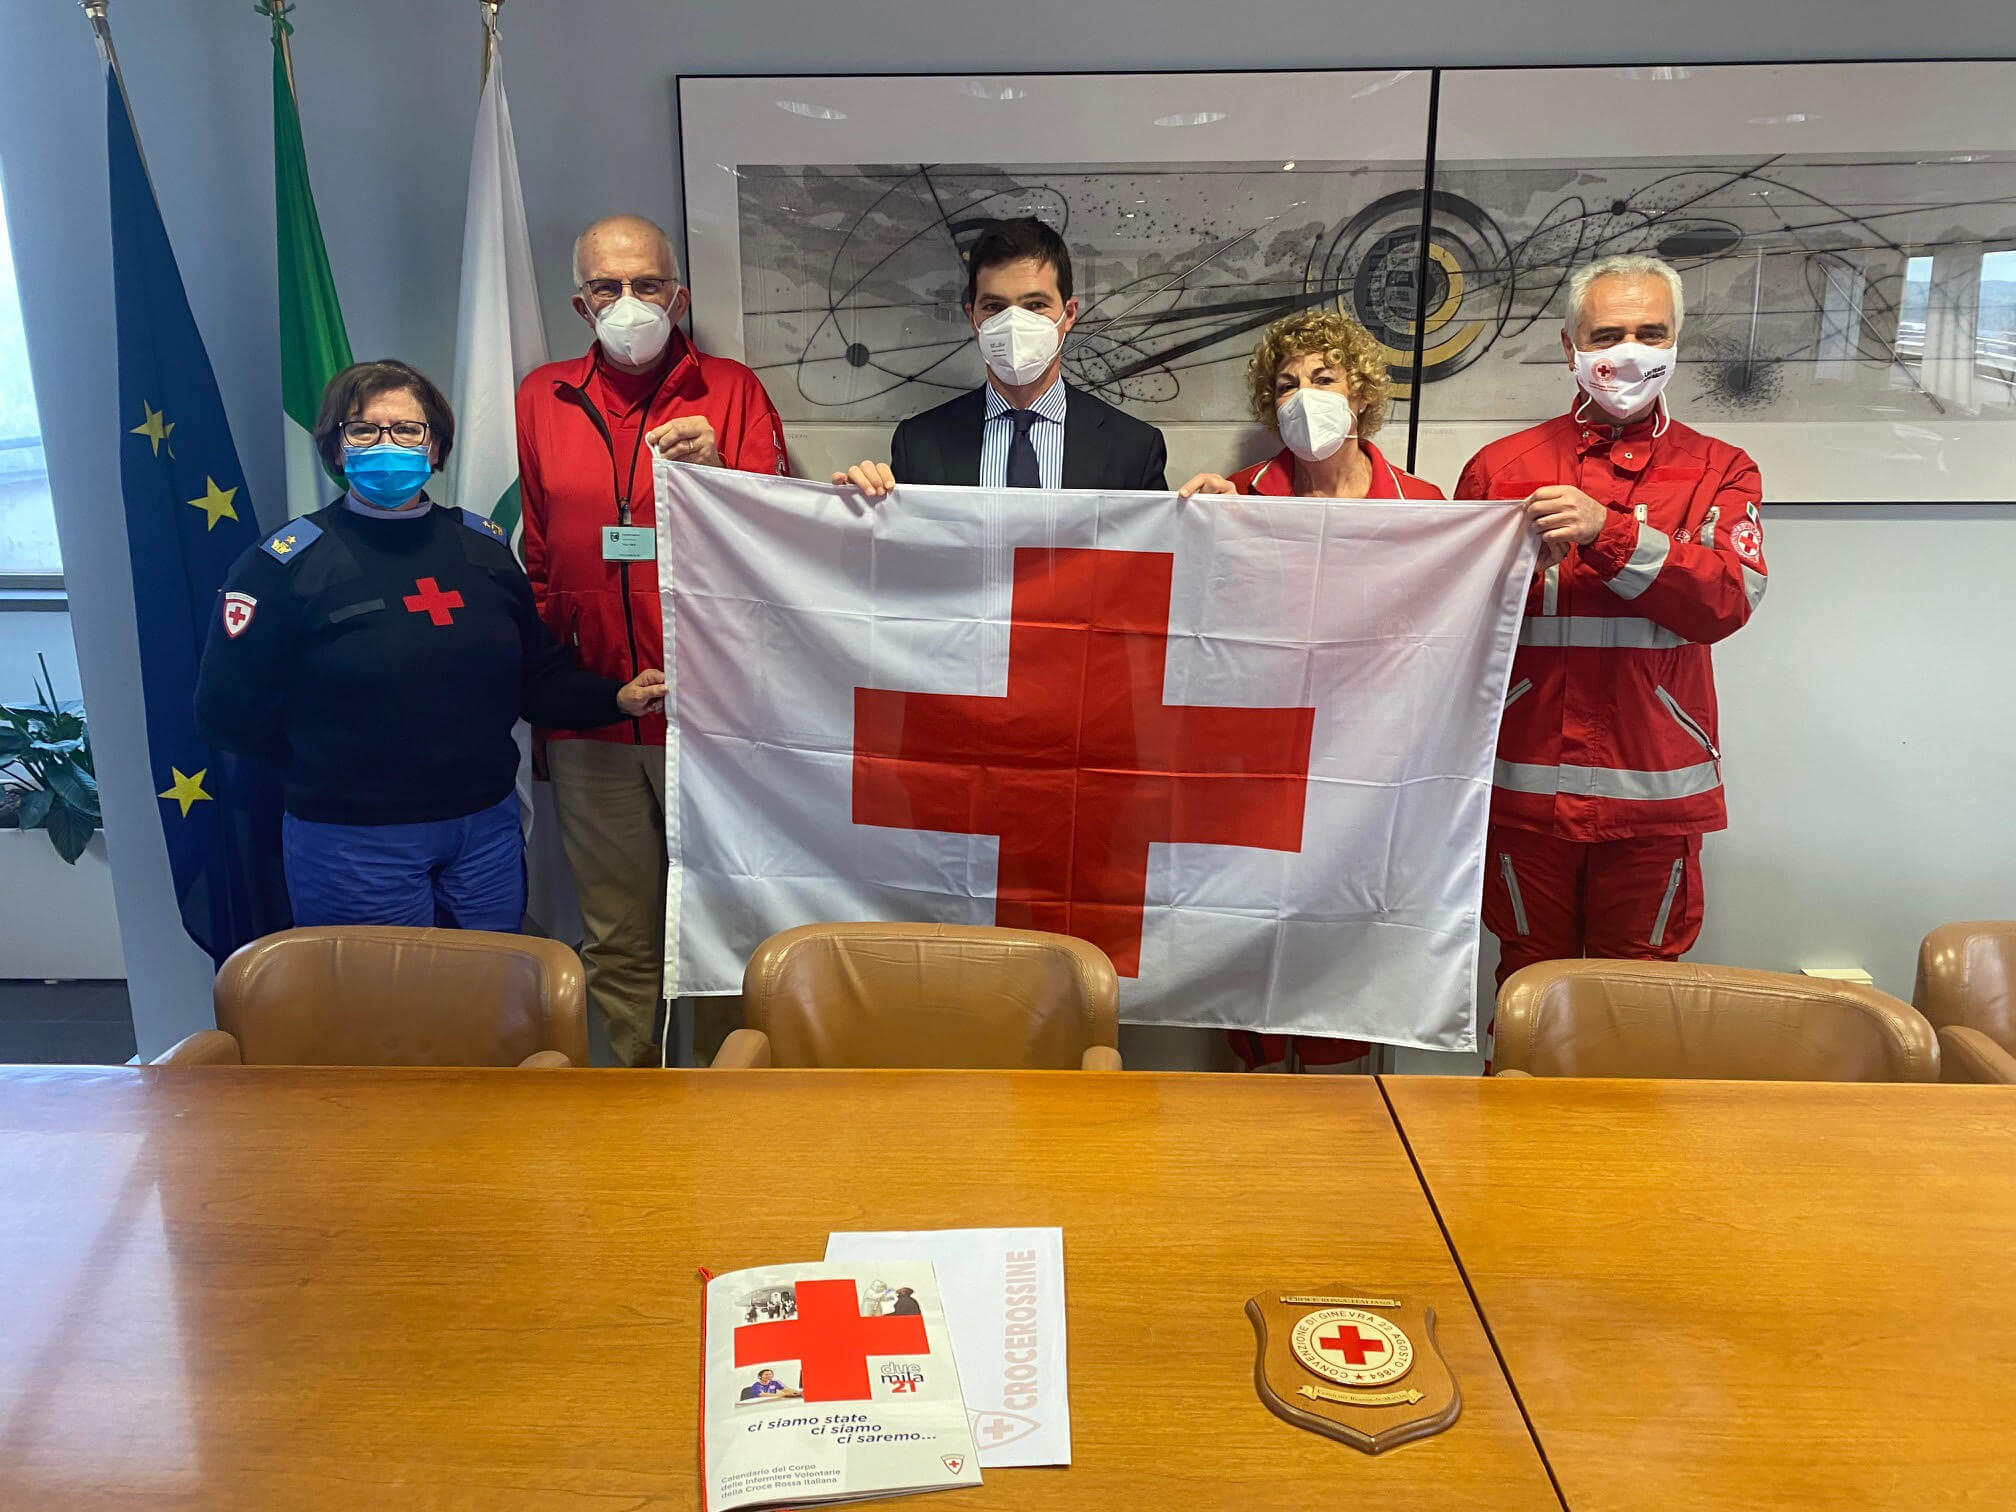 francesco acquaroli croce rossa bandiera